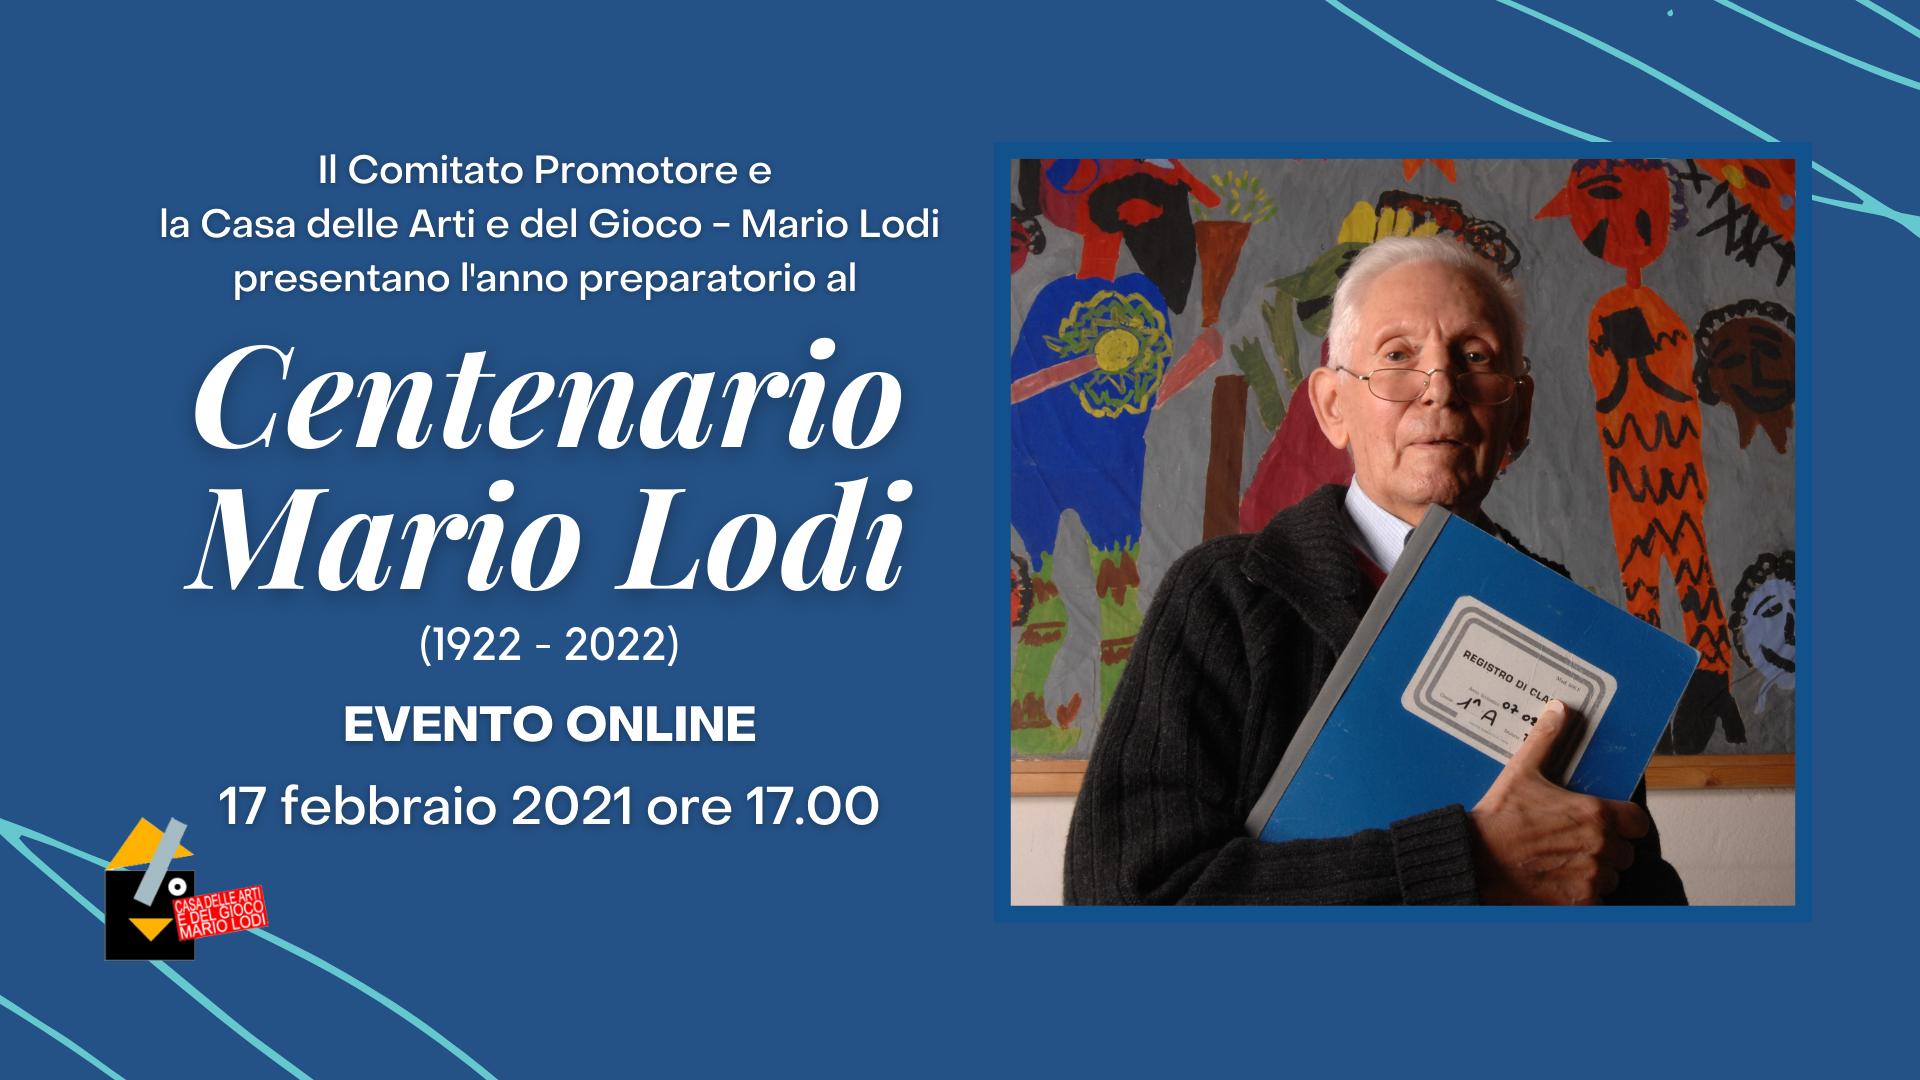 Centenario Mario Lodi